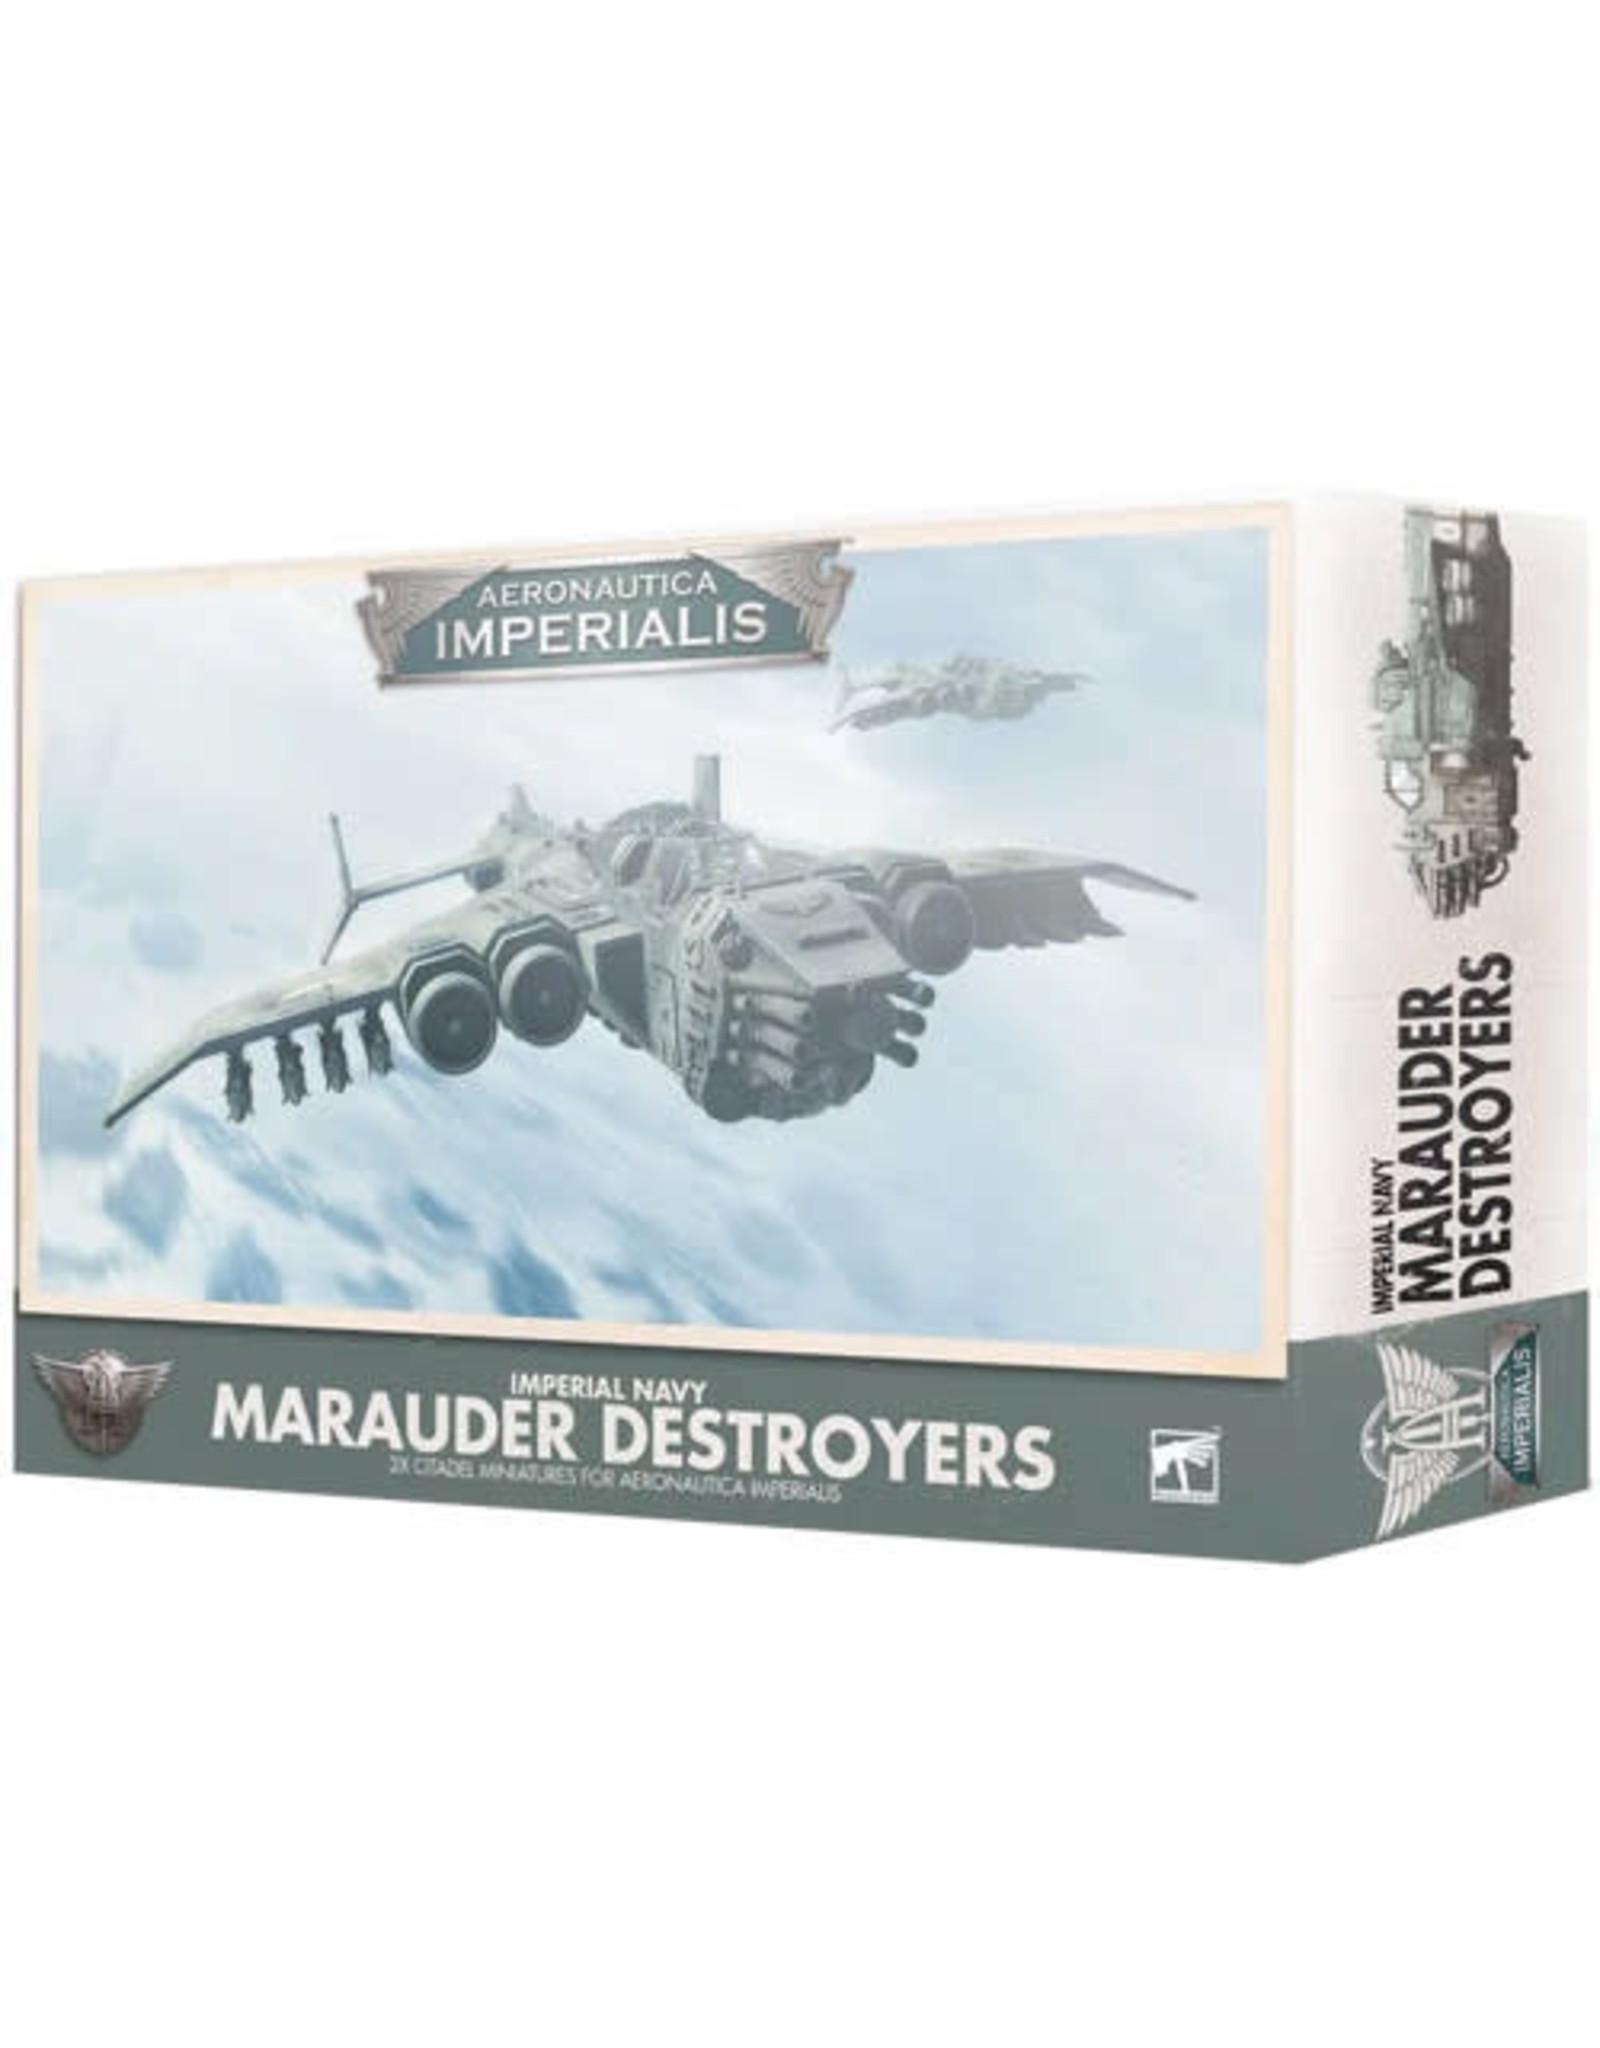 Imperial Navy Marauder Destroyer (A/I)